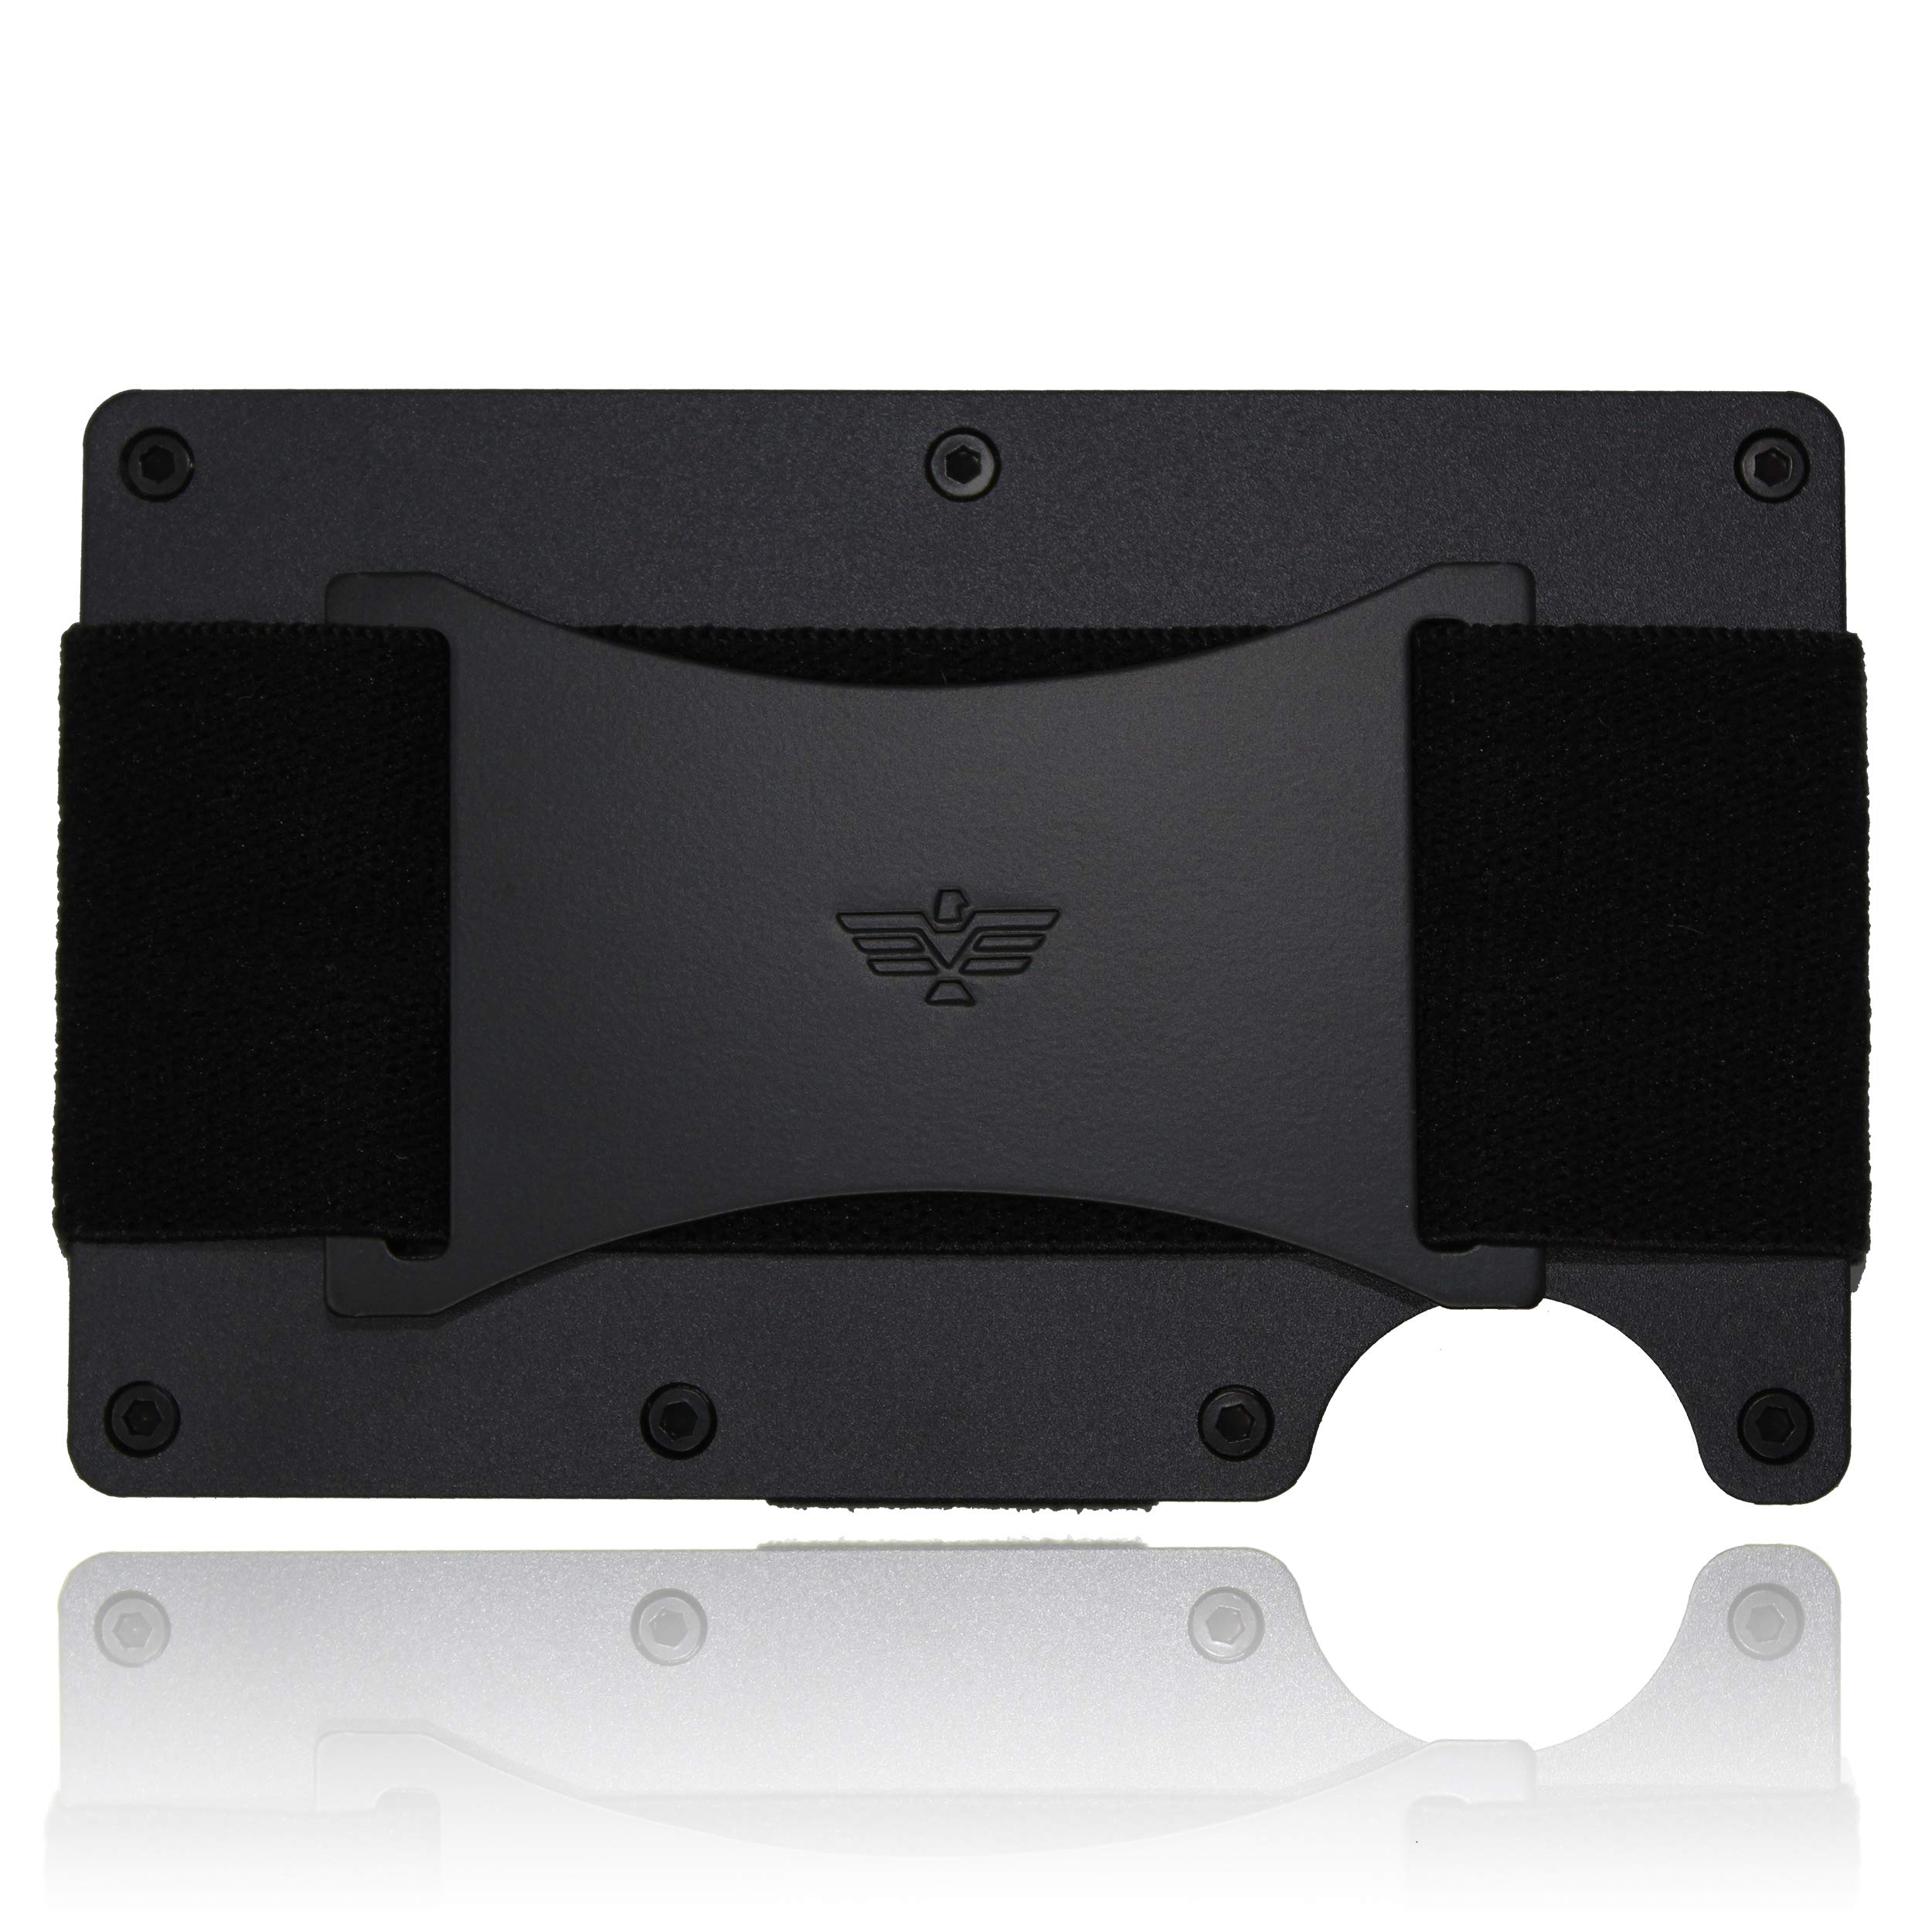 9bf1ec963cf8 Slim Minimalist Aluminum Wallet for Men/Credit Card Holder for Men with  Cash Strap product